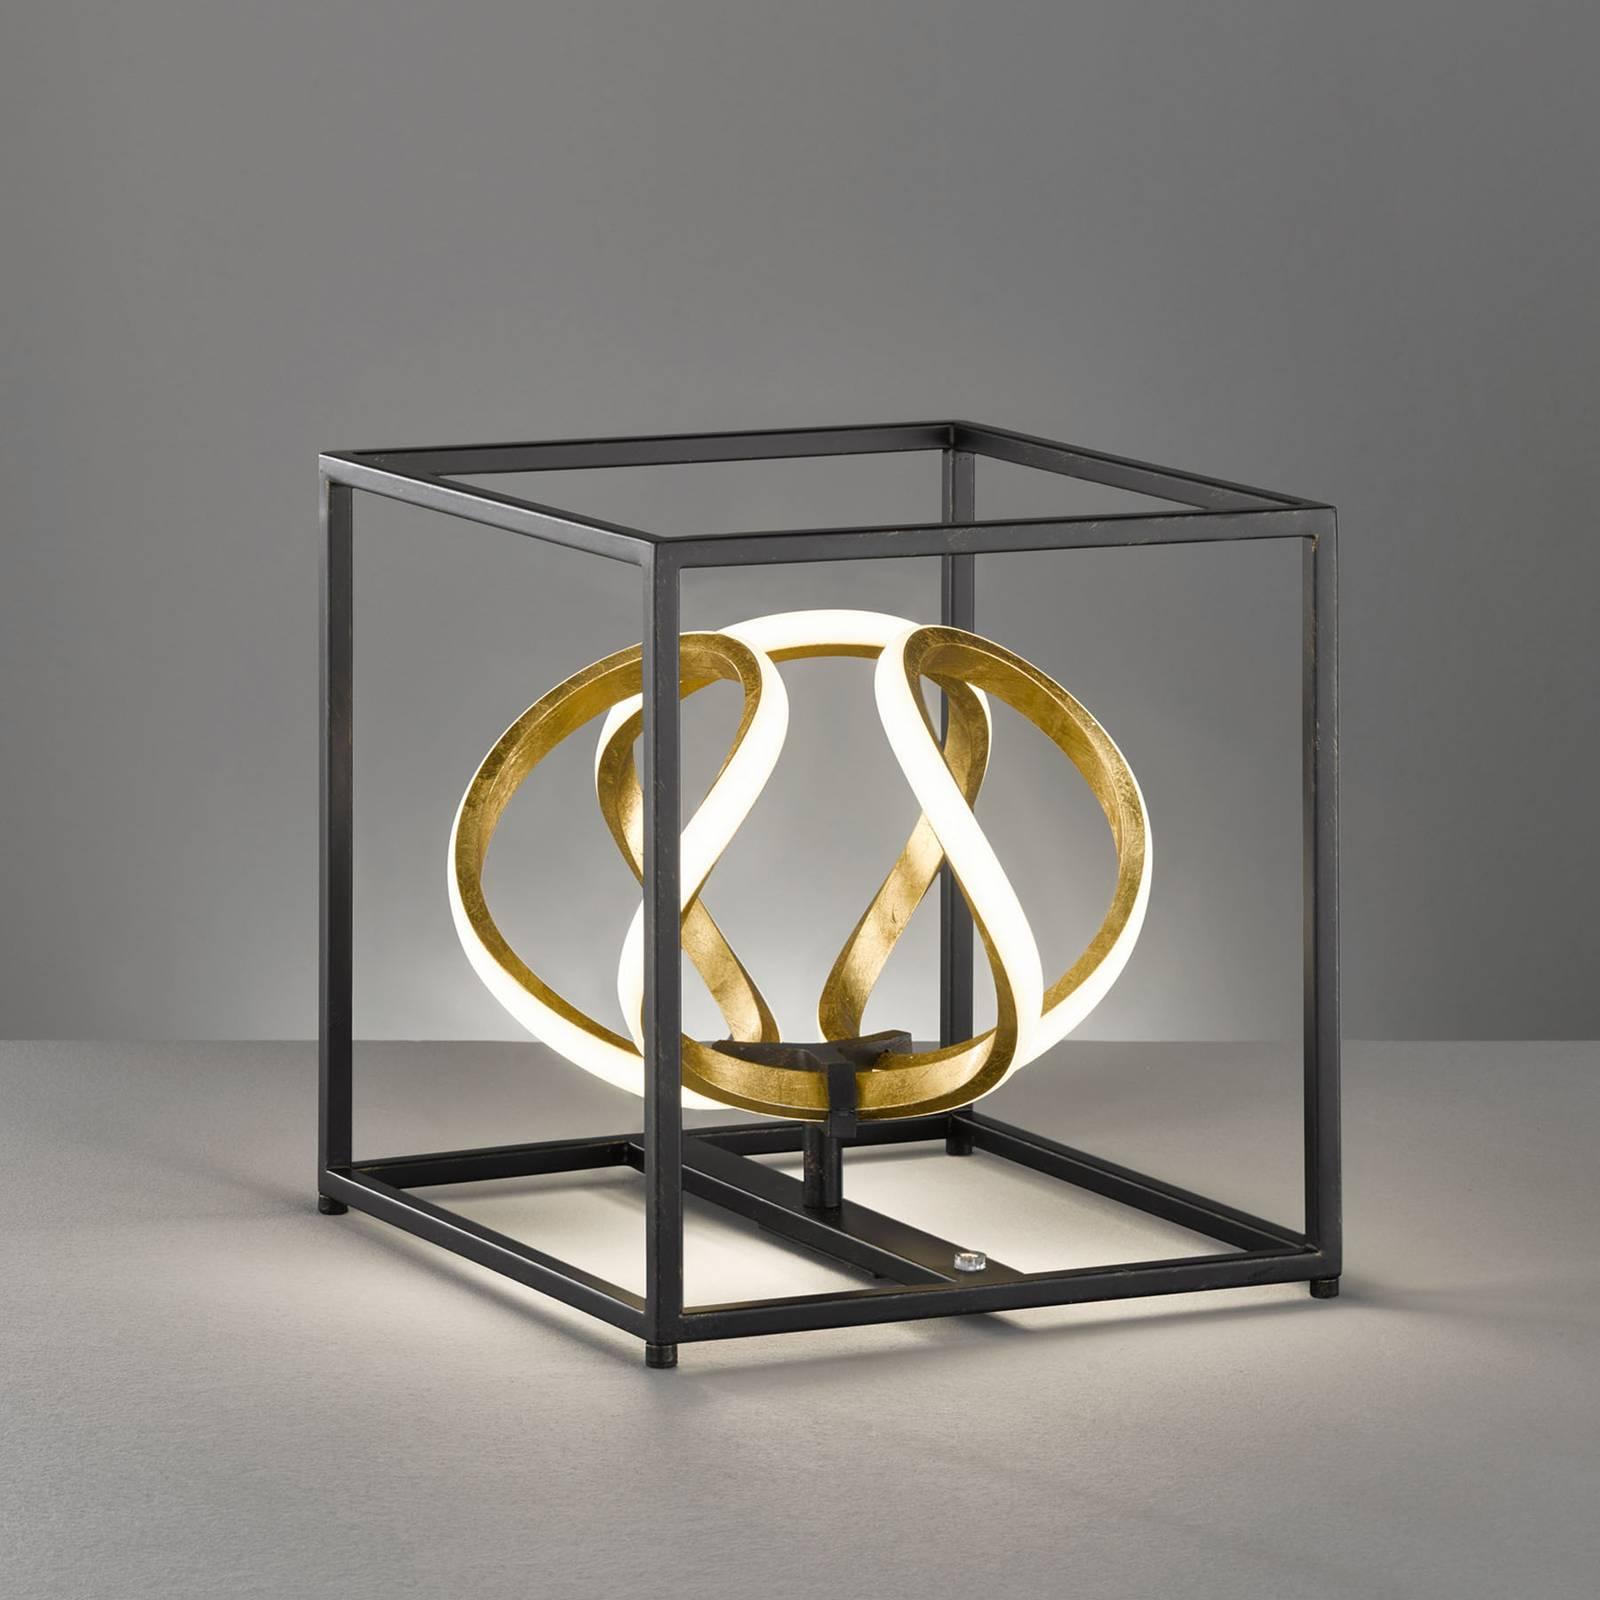 LED-pöytälamppu Gesa, musta ja kulta